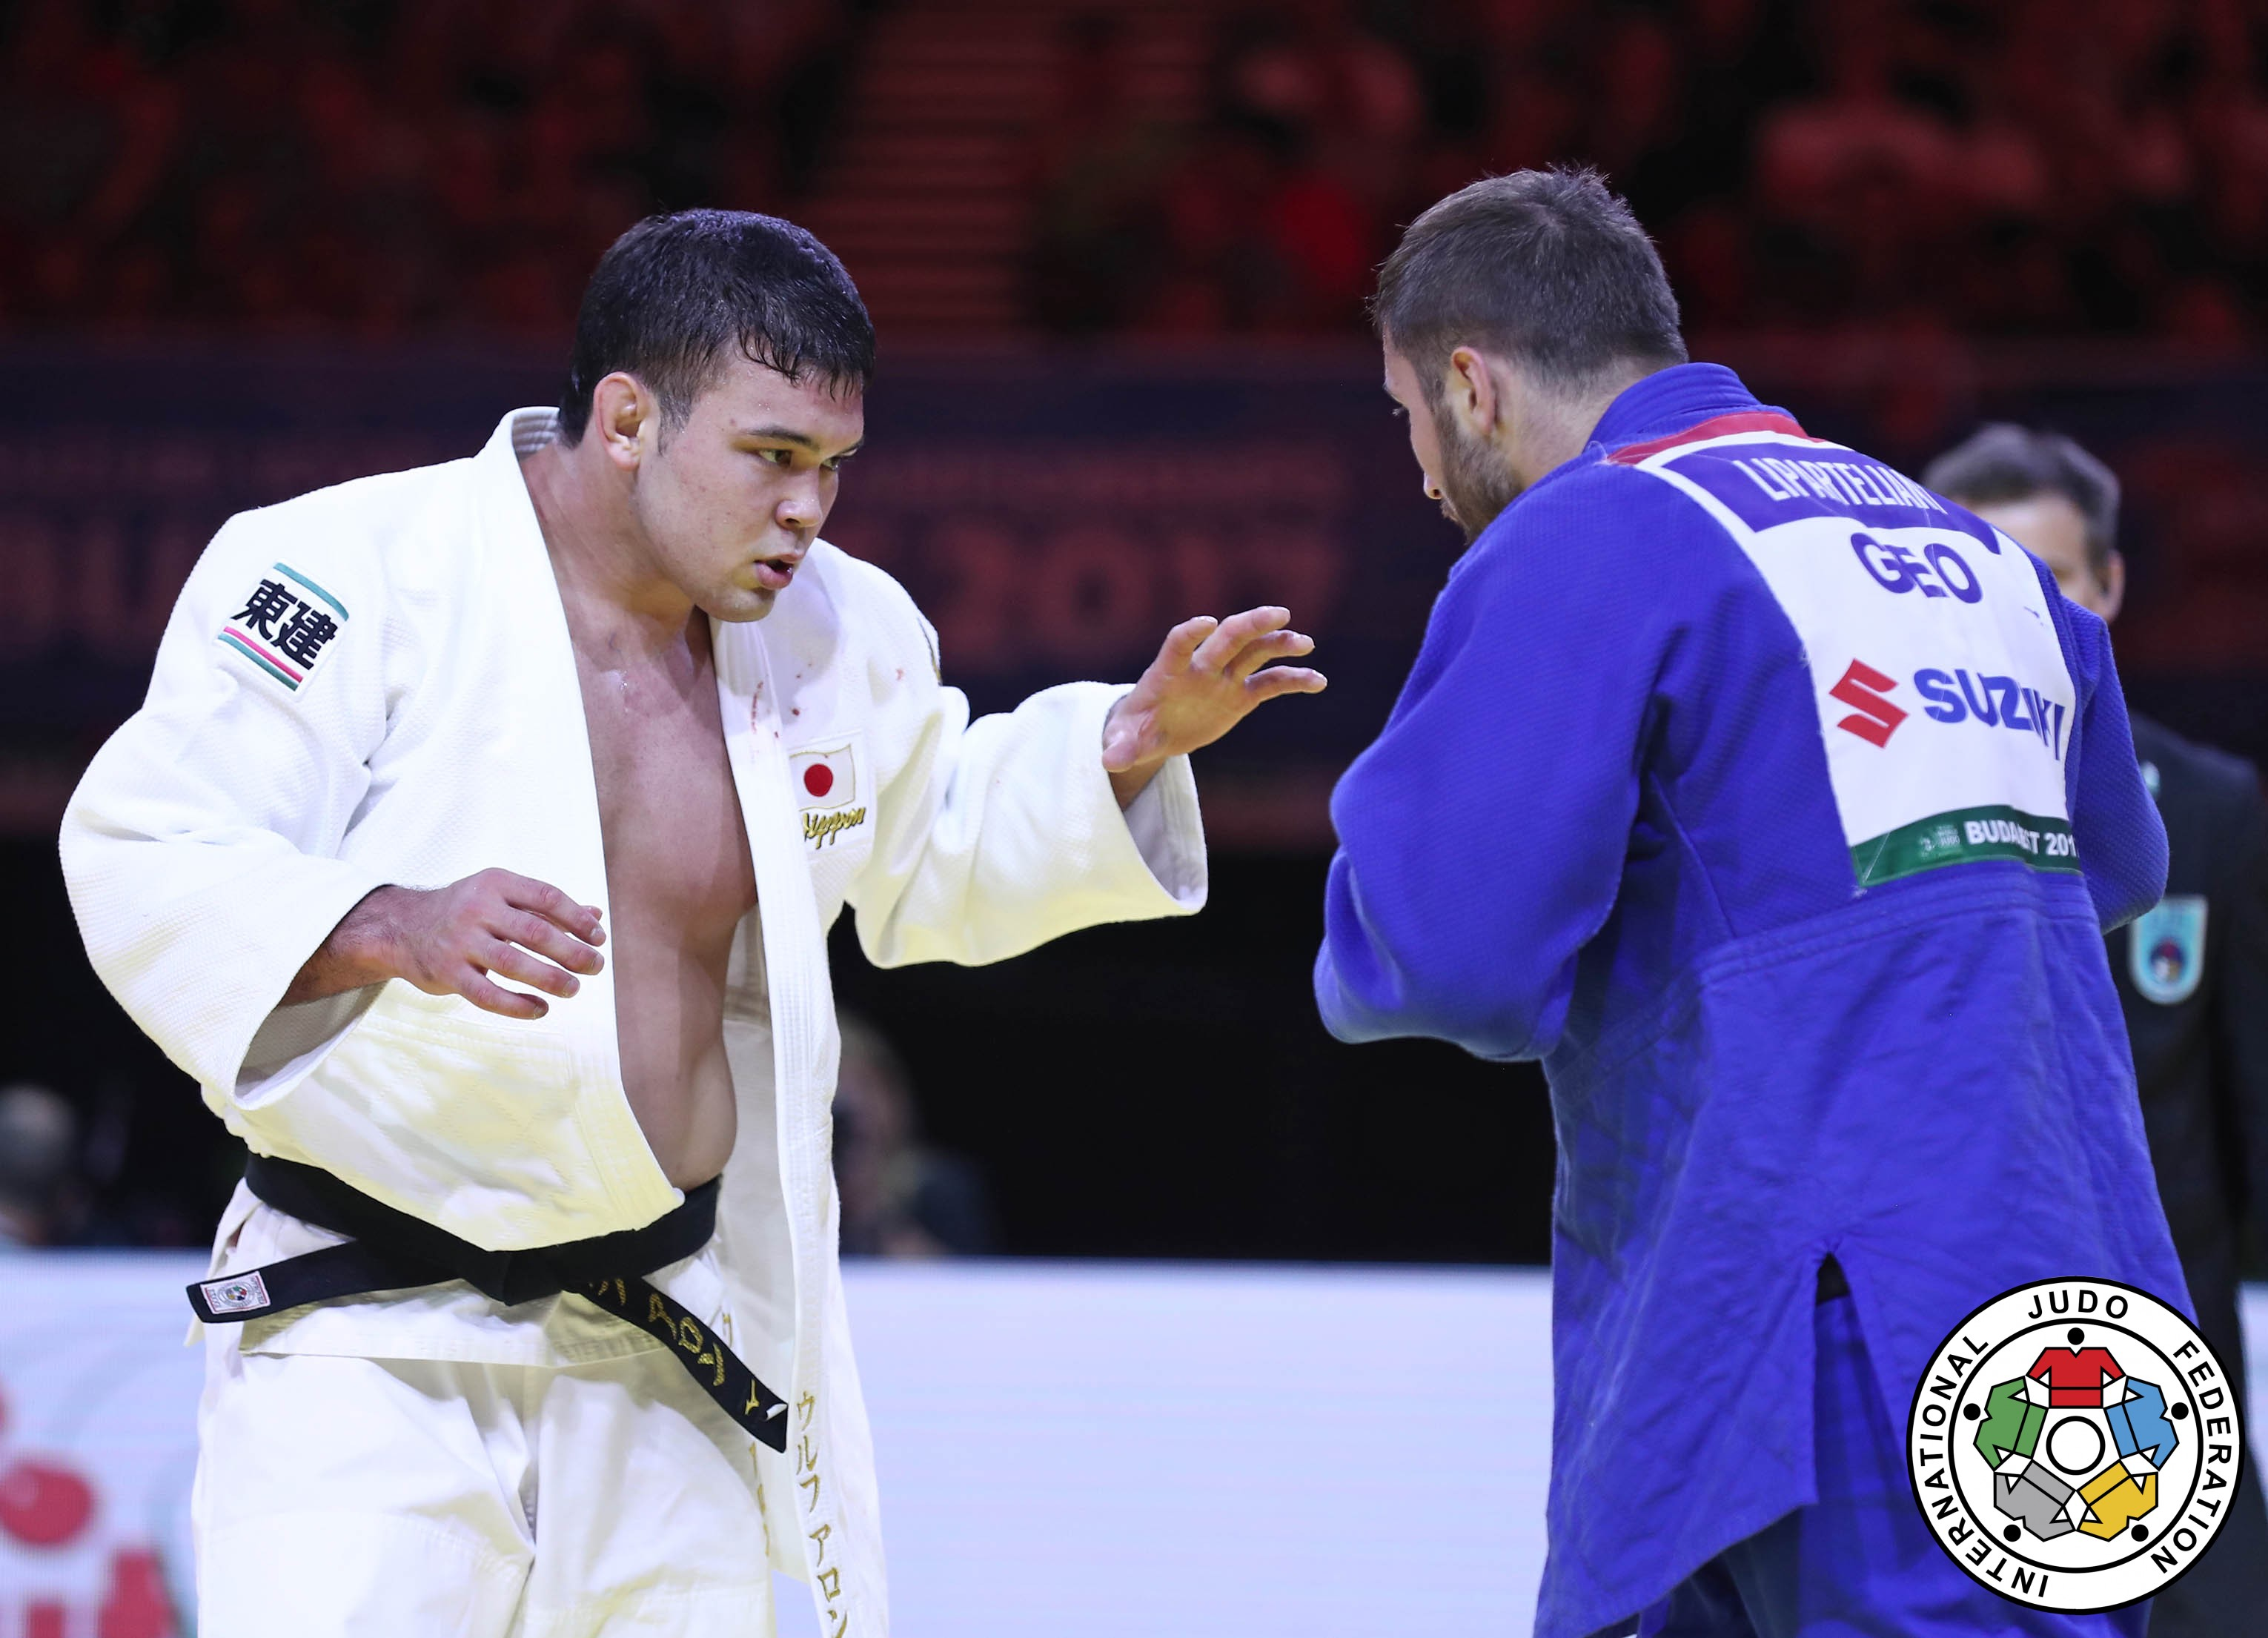 Nemanja Majdov sériva Rafael Macedo  -90 kg masculino judô Jogos Olímpicos de Tóquio 2020 Olimpíada